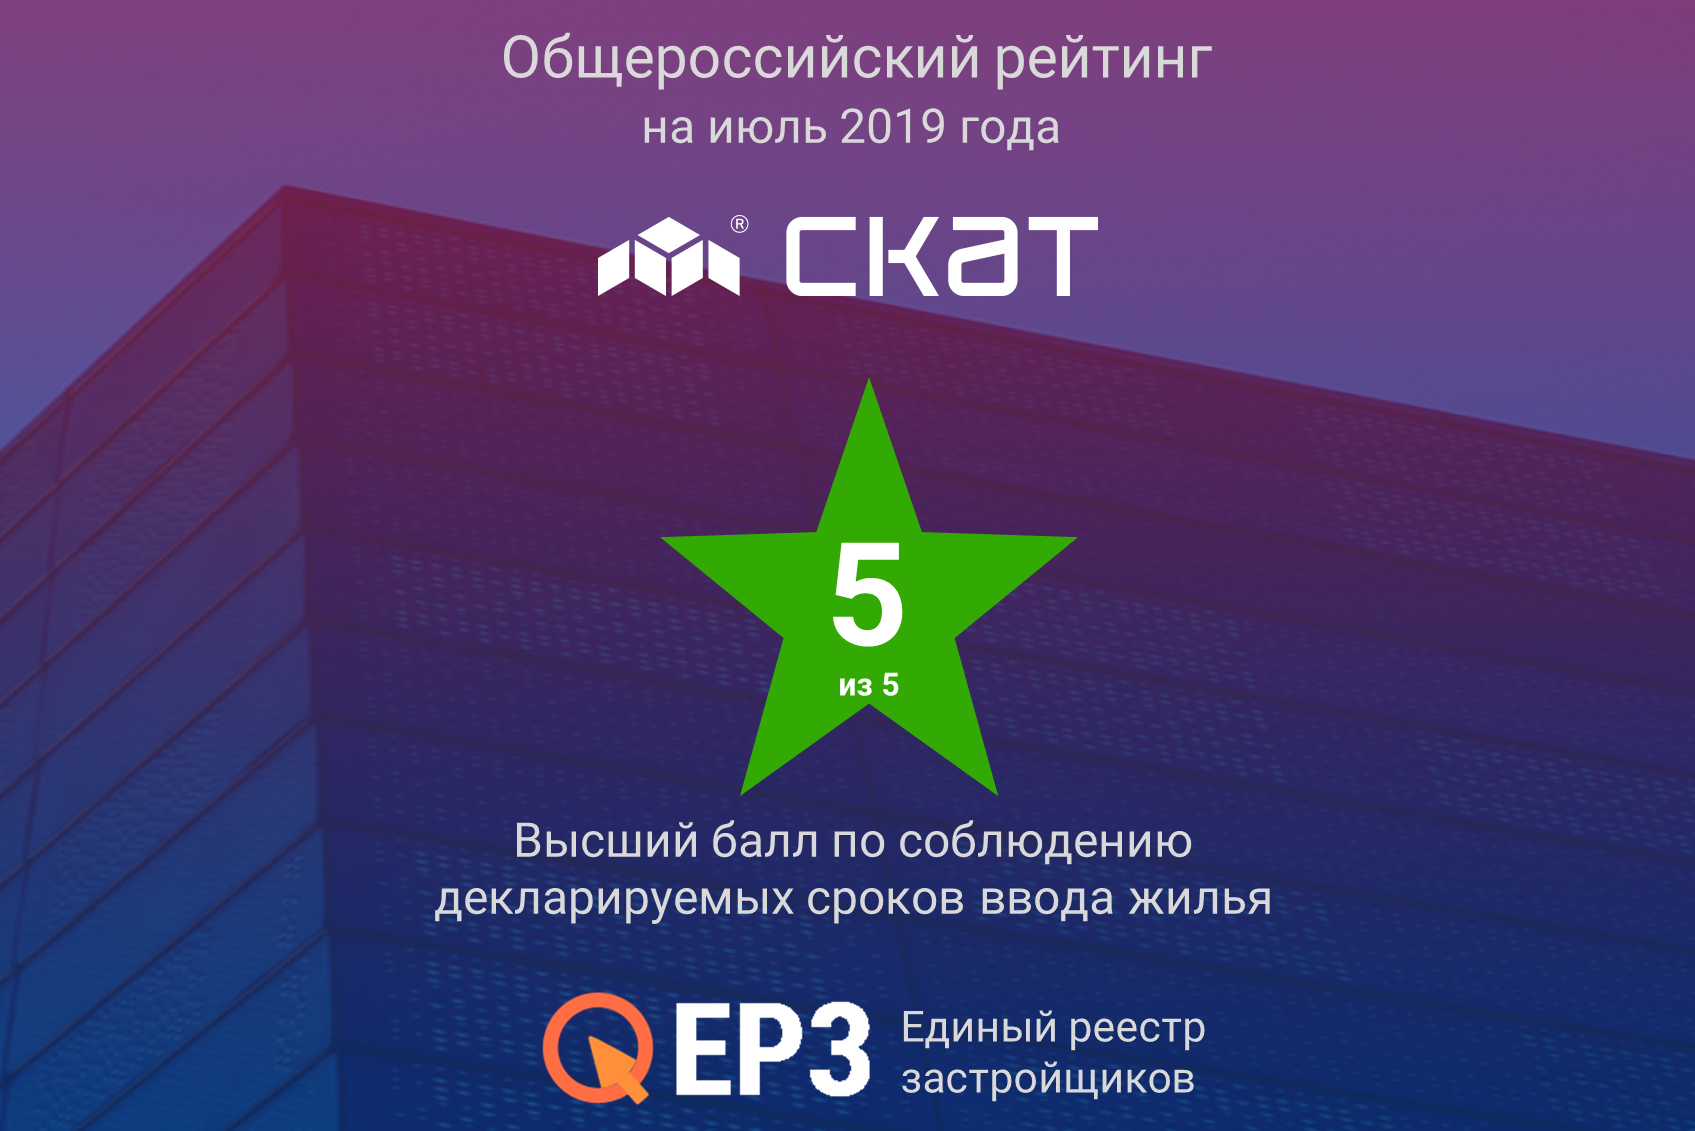 SKAT_-Respublika-Komi_reyting_1695x1131.jpg